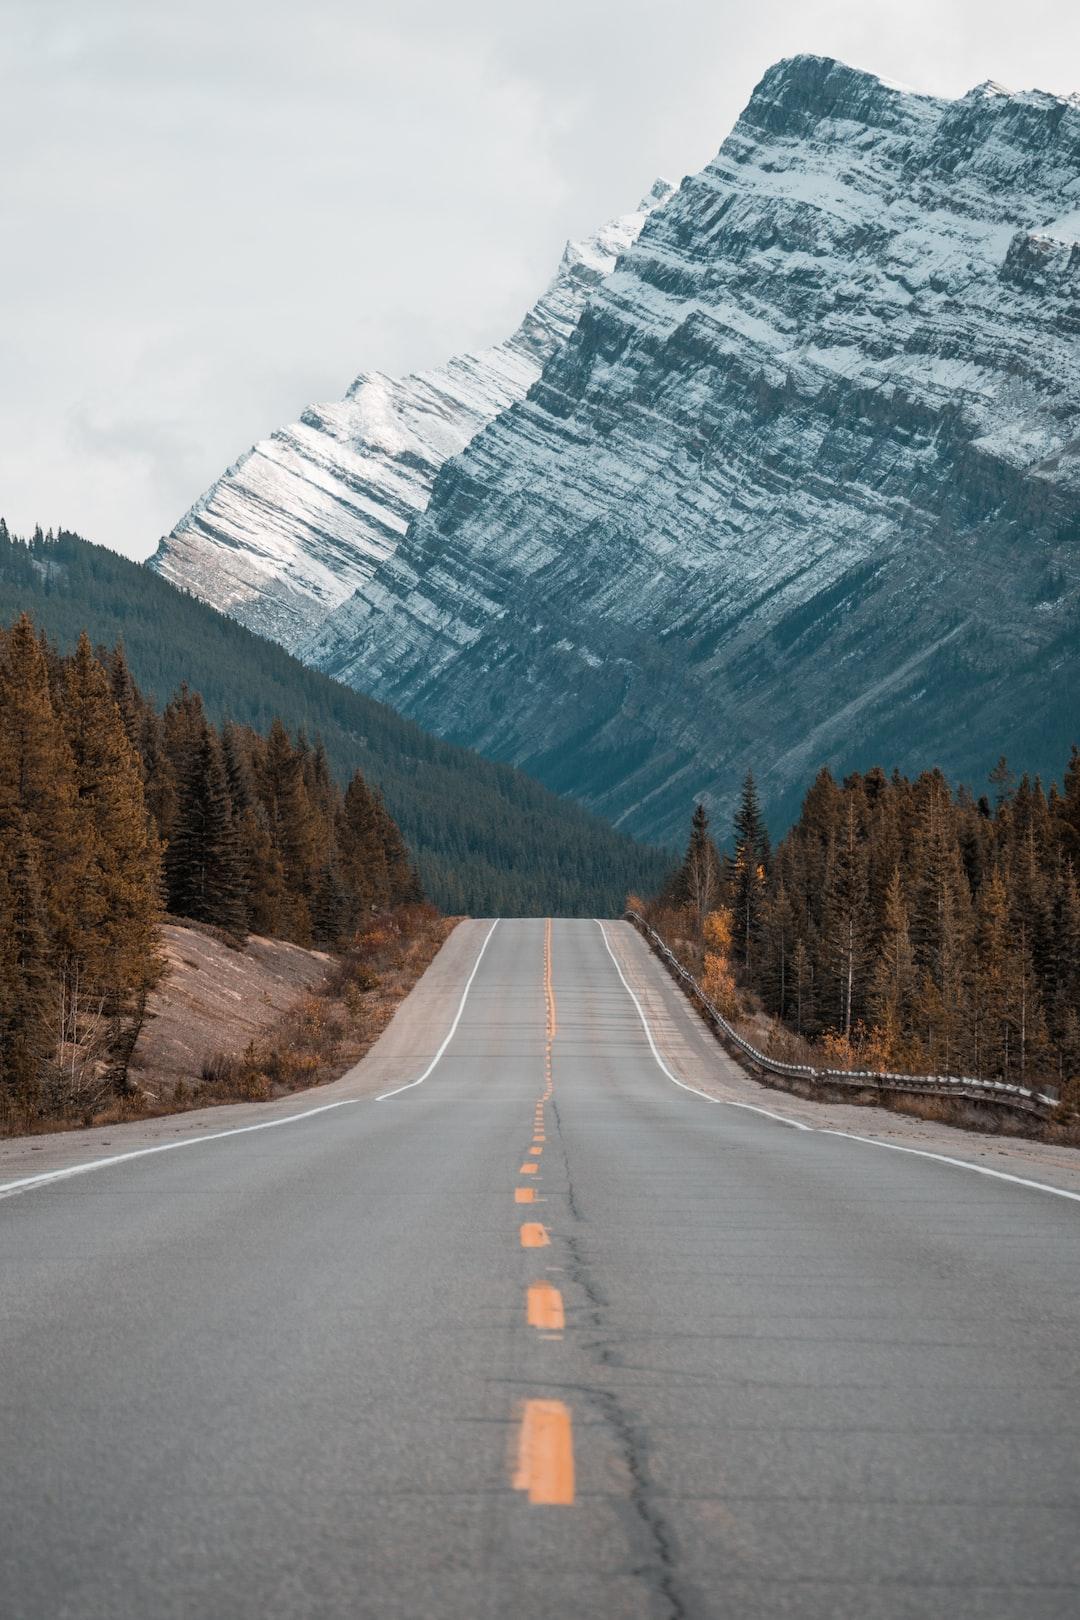 Road along steep mountains